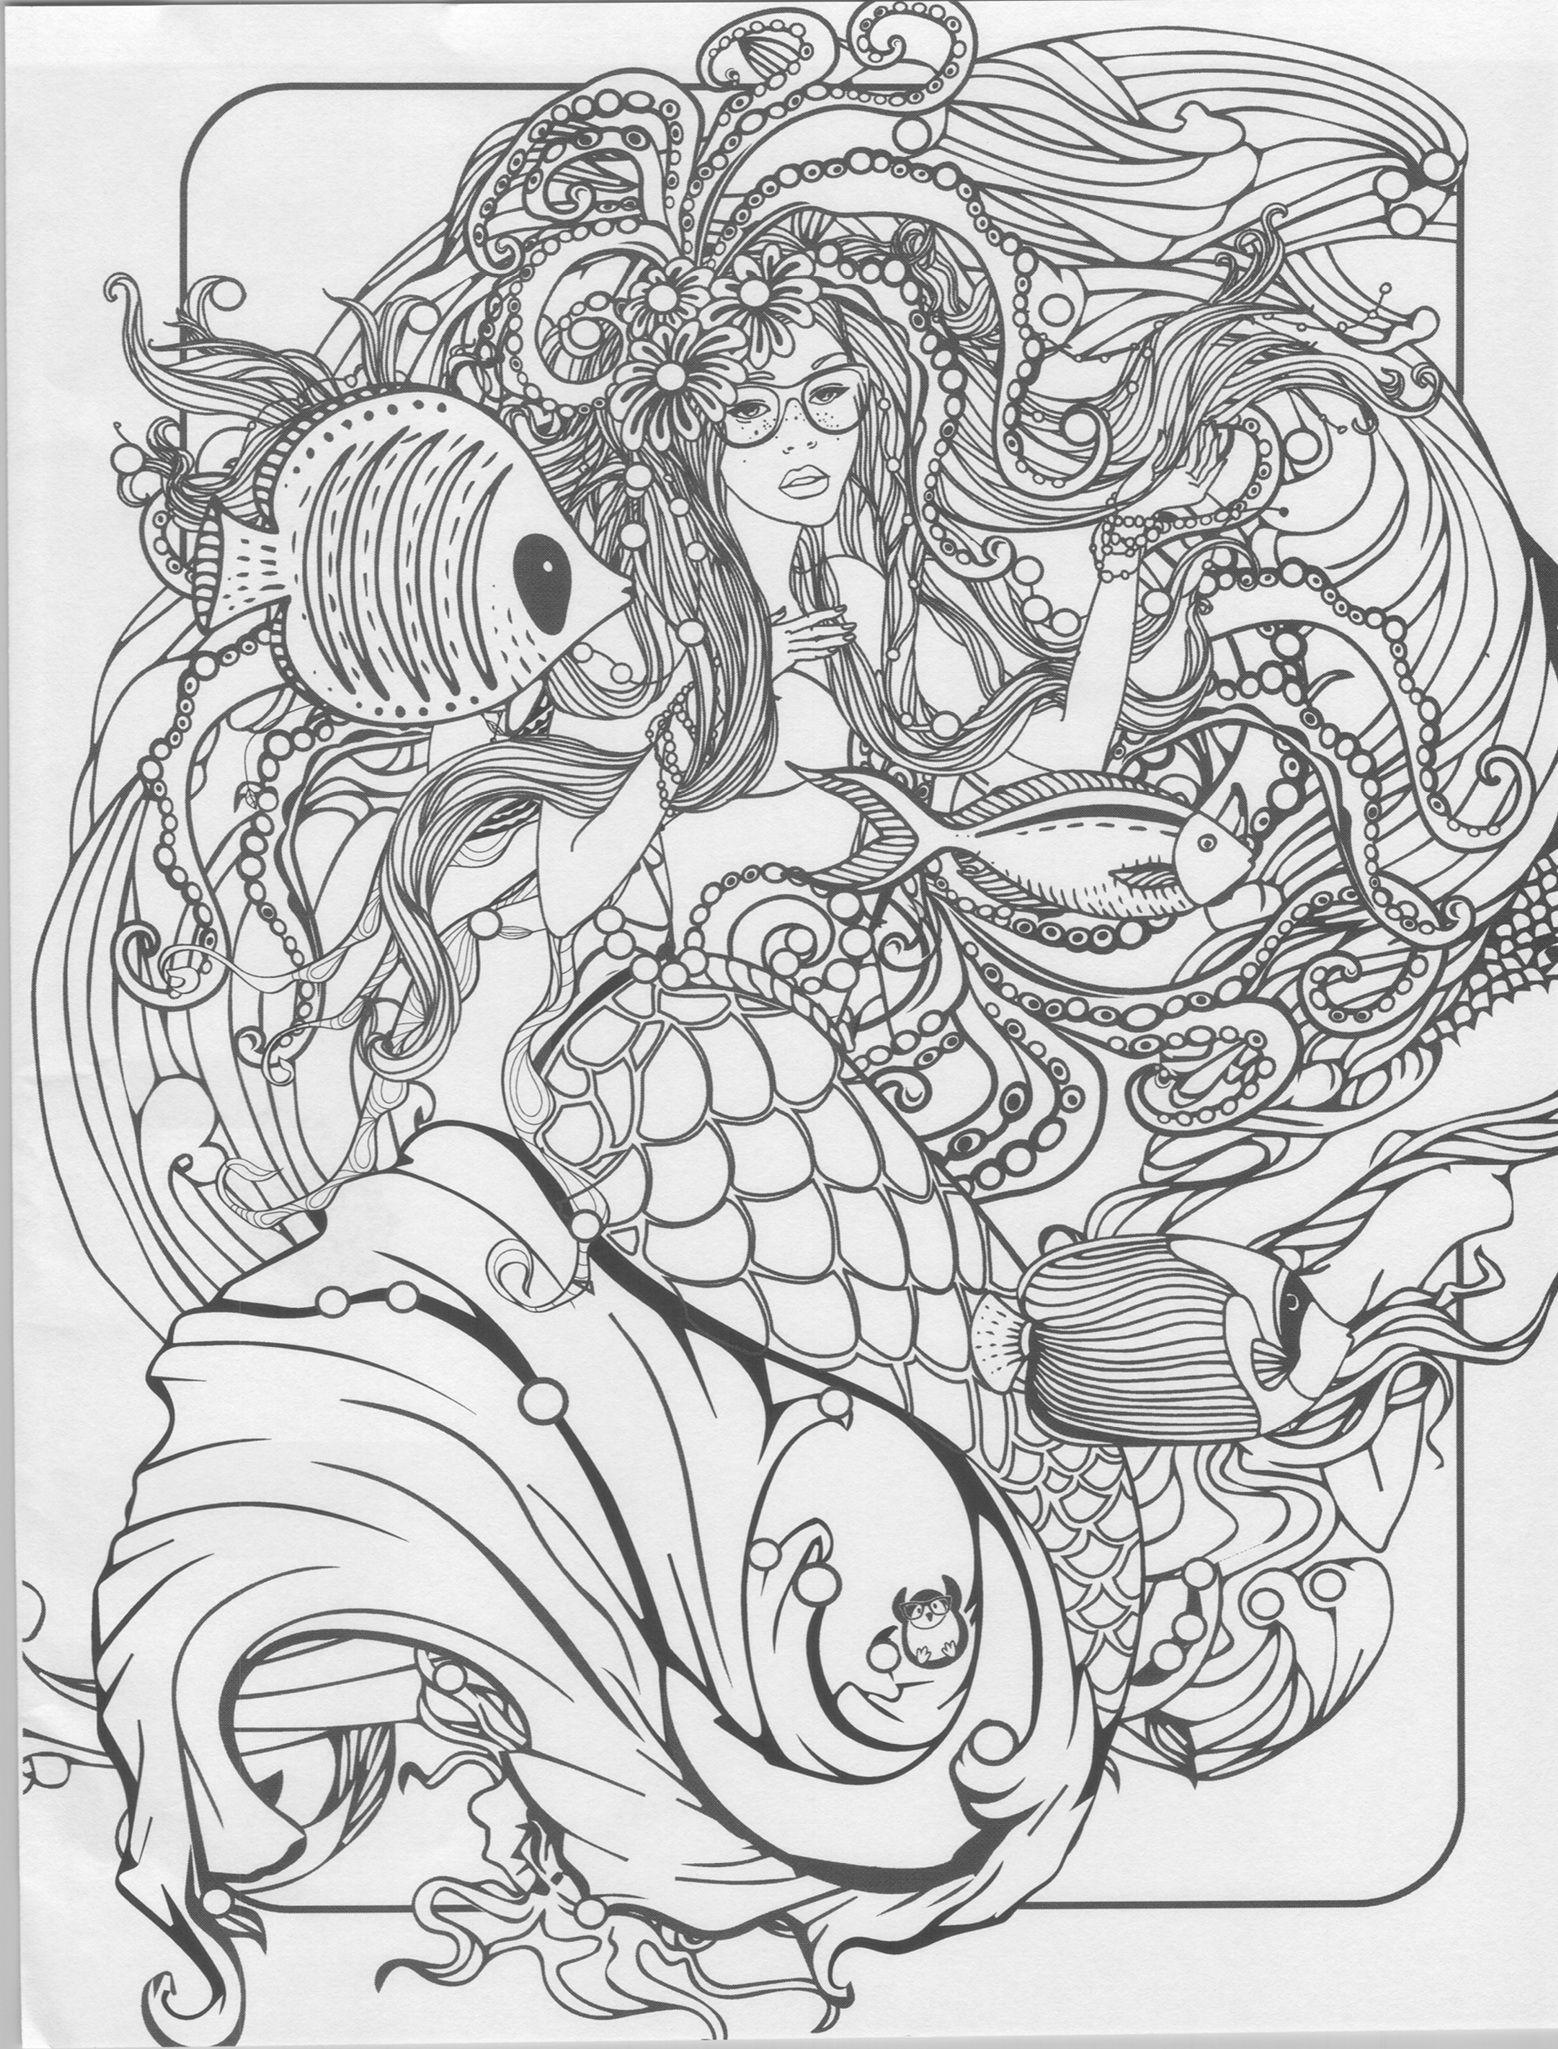 Mermaid coloring page | Mermaid Coloring Pages for Adults | Pinterest